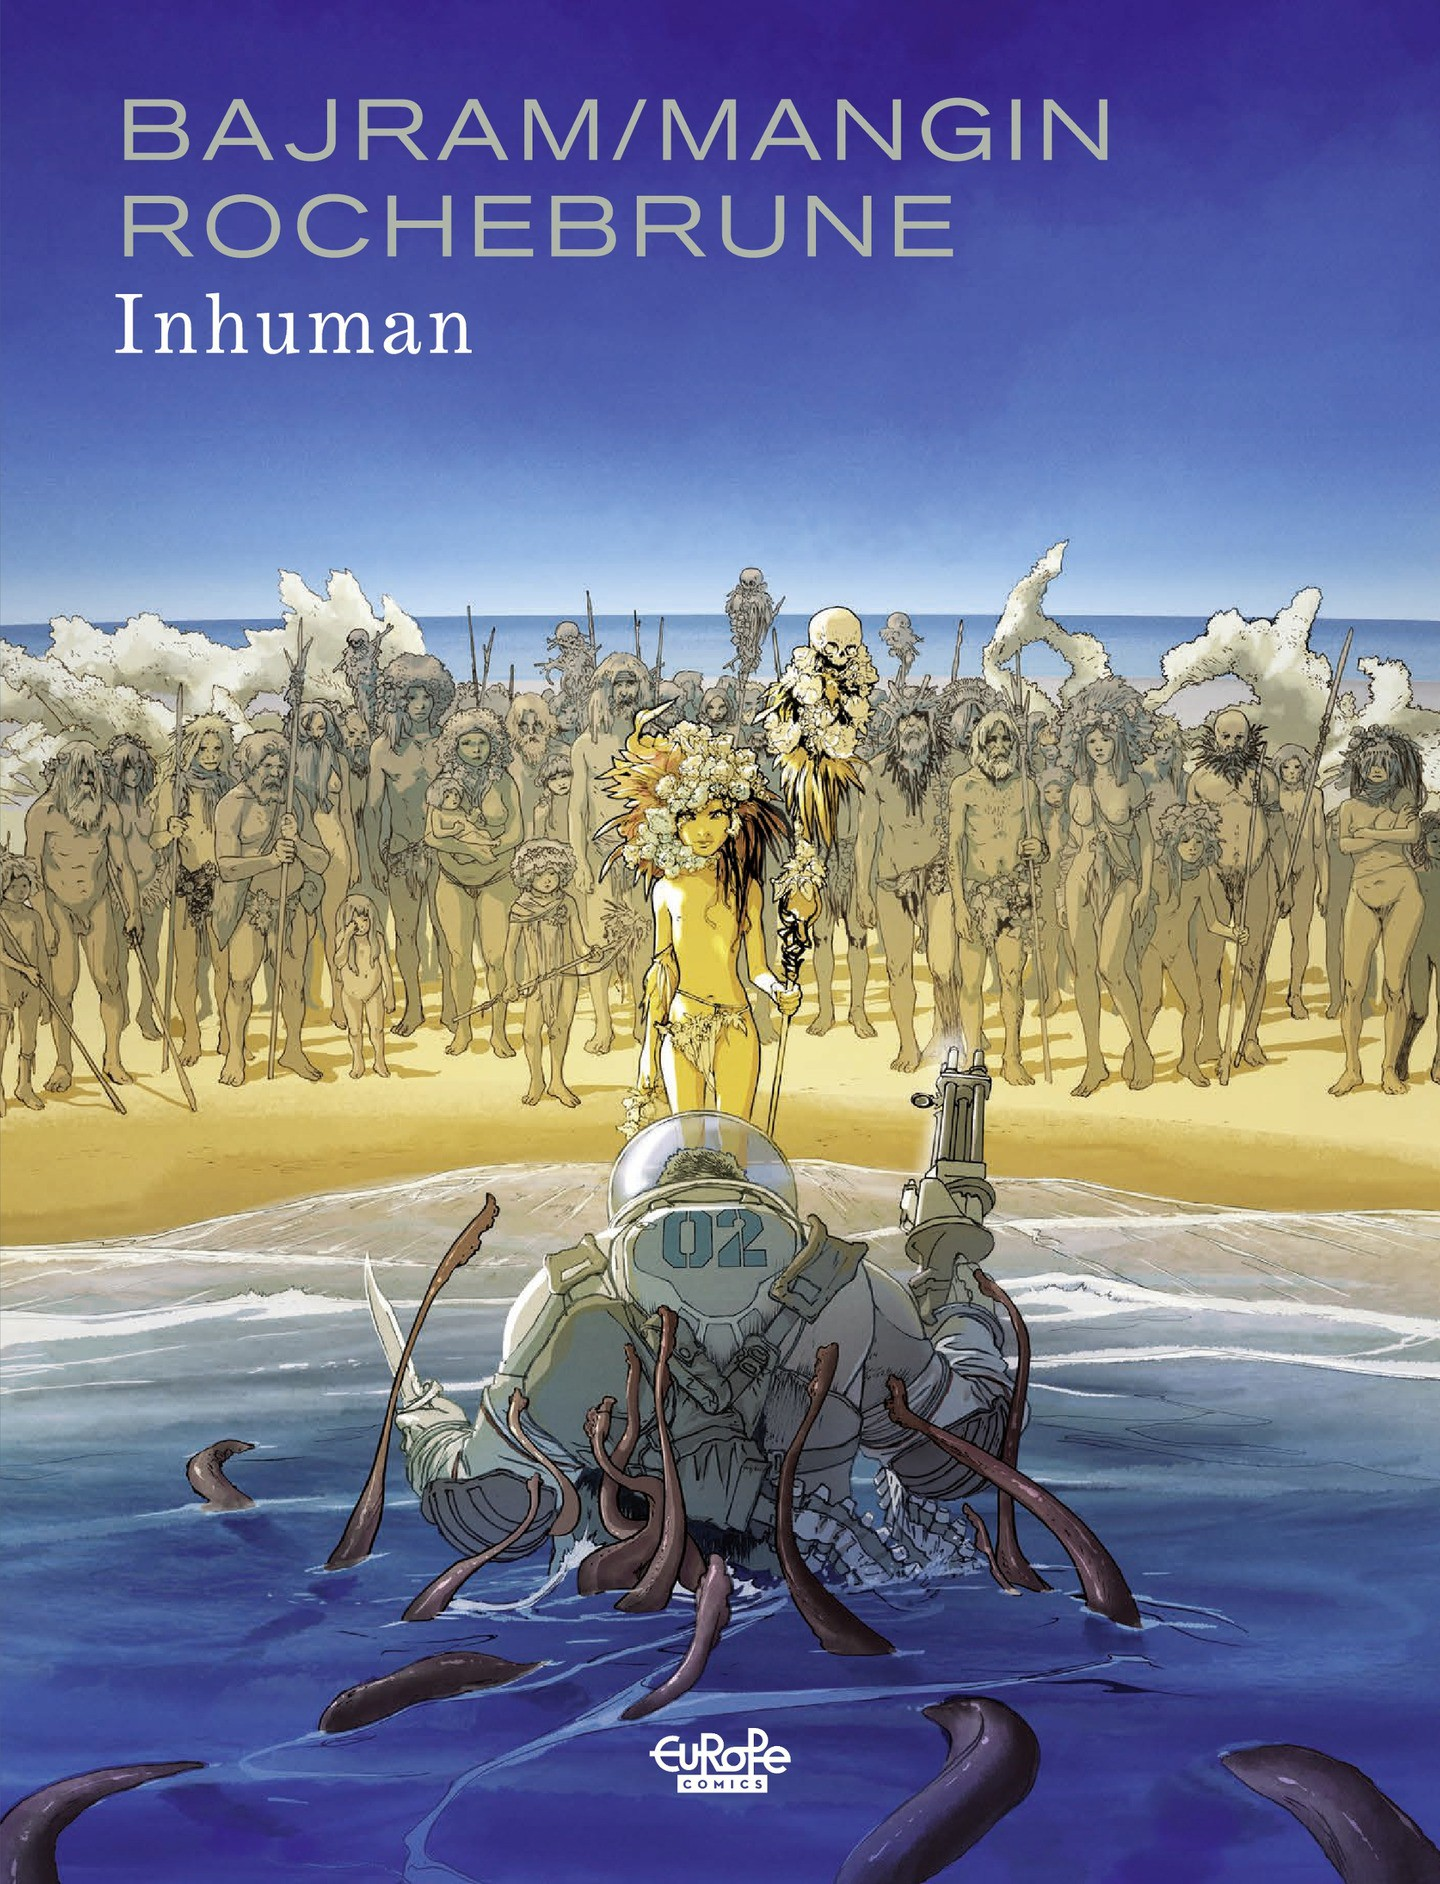 Inhuman by Valérie Mangin, Denis Bajram